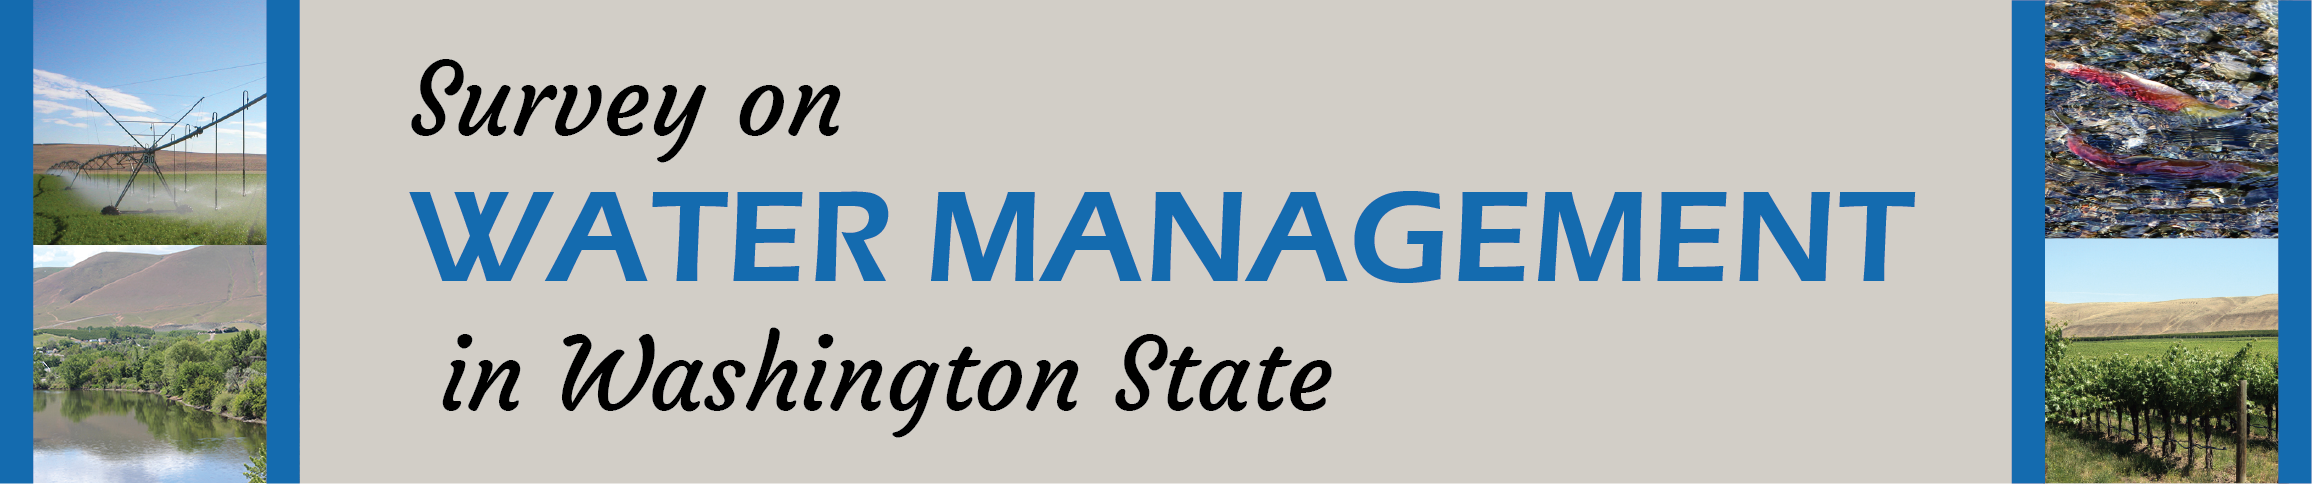 Survey on Water Management in Washington State